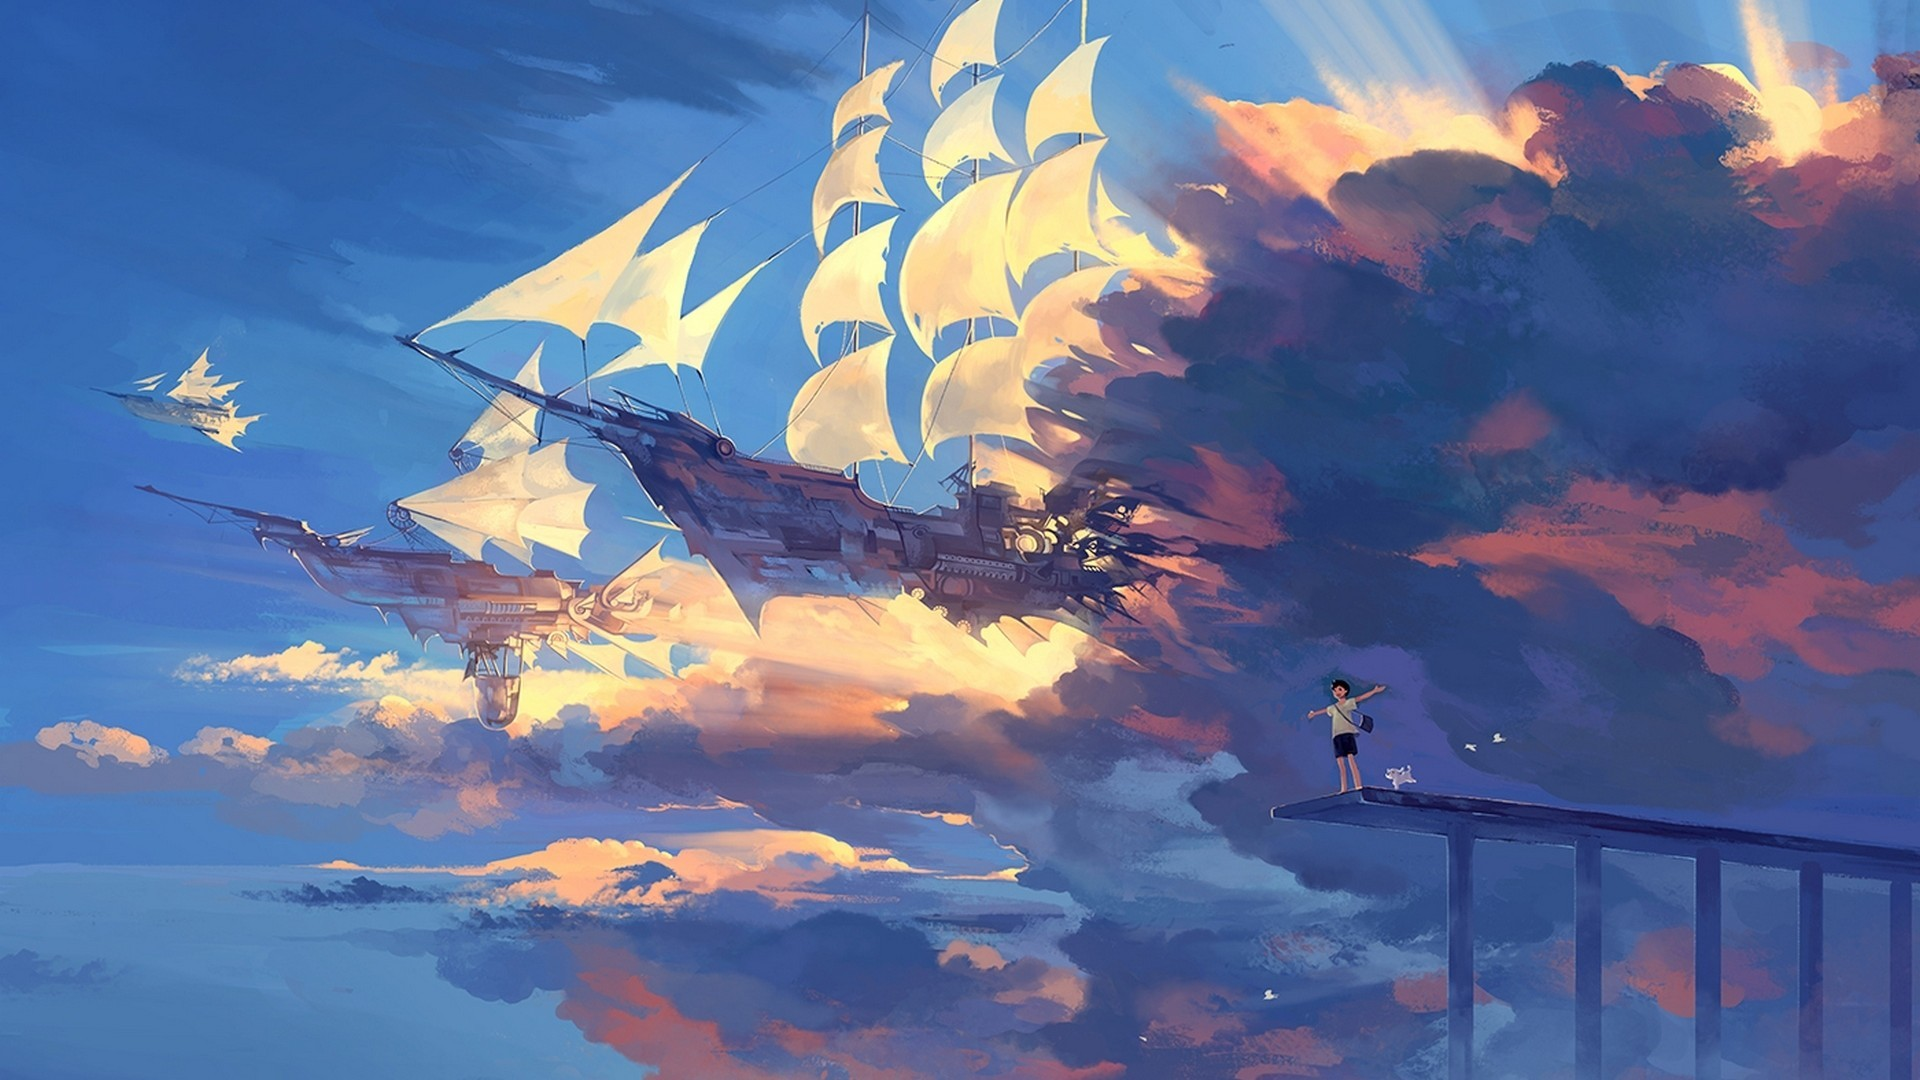 Phone Wallpaper Boy And Girl Sunset Anime Free Anime Landscape Backgrounds Pixelstalk Net